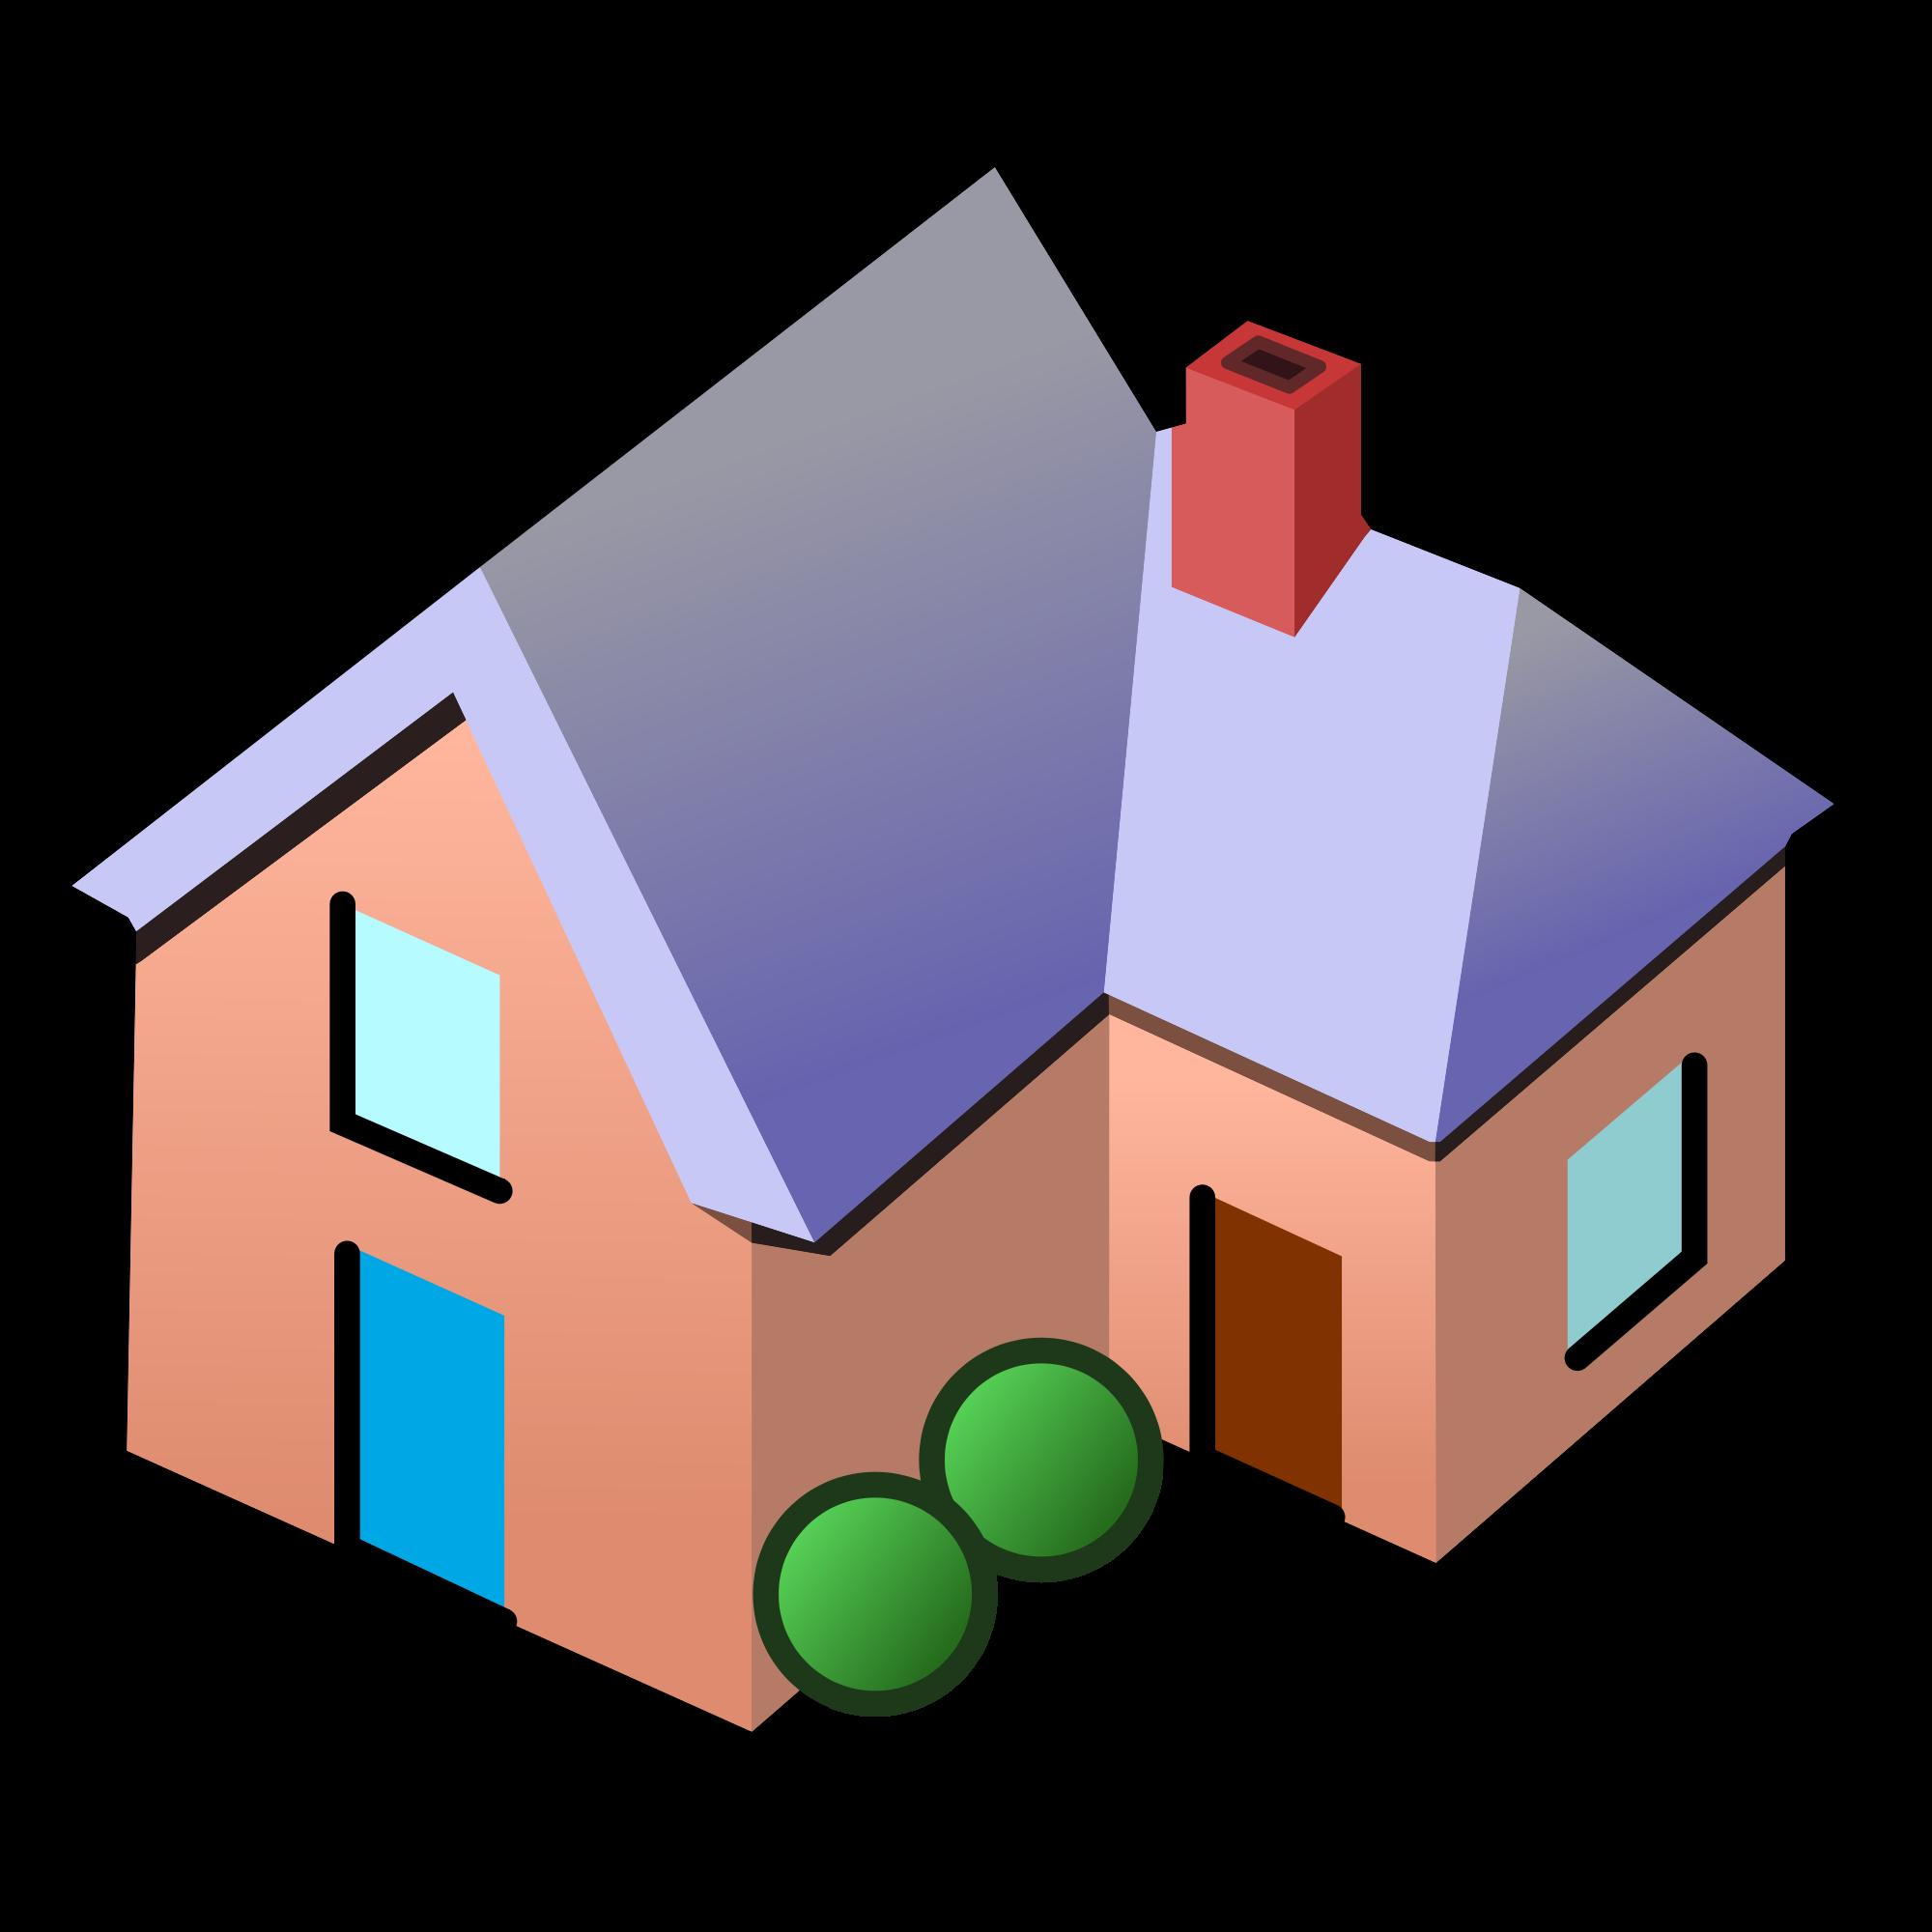 File svg icon wikimedia. Home clipart small house